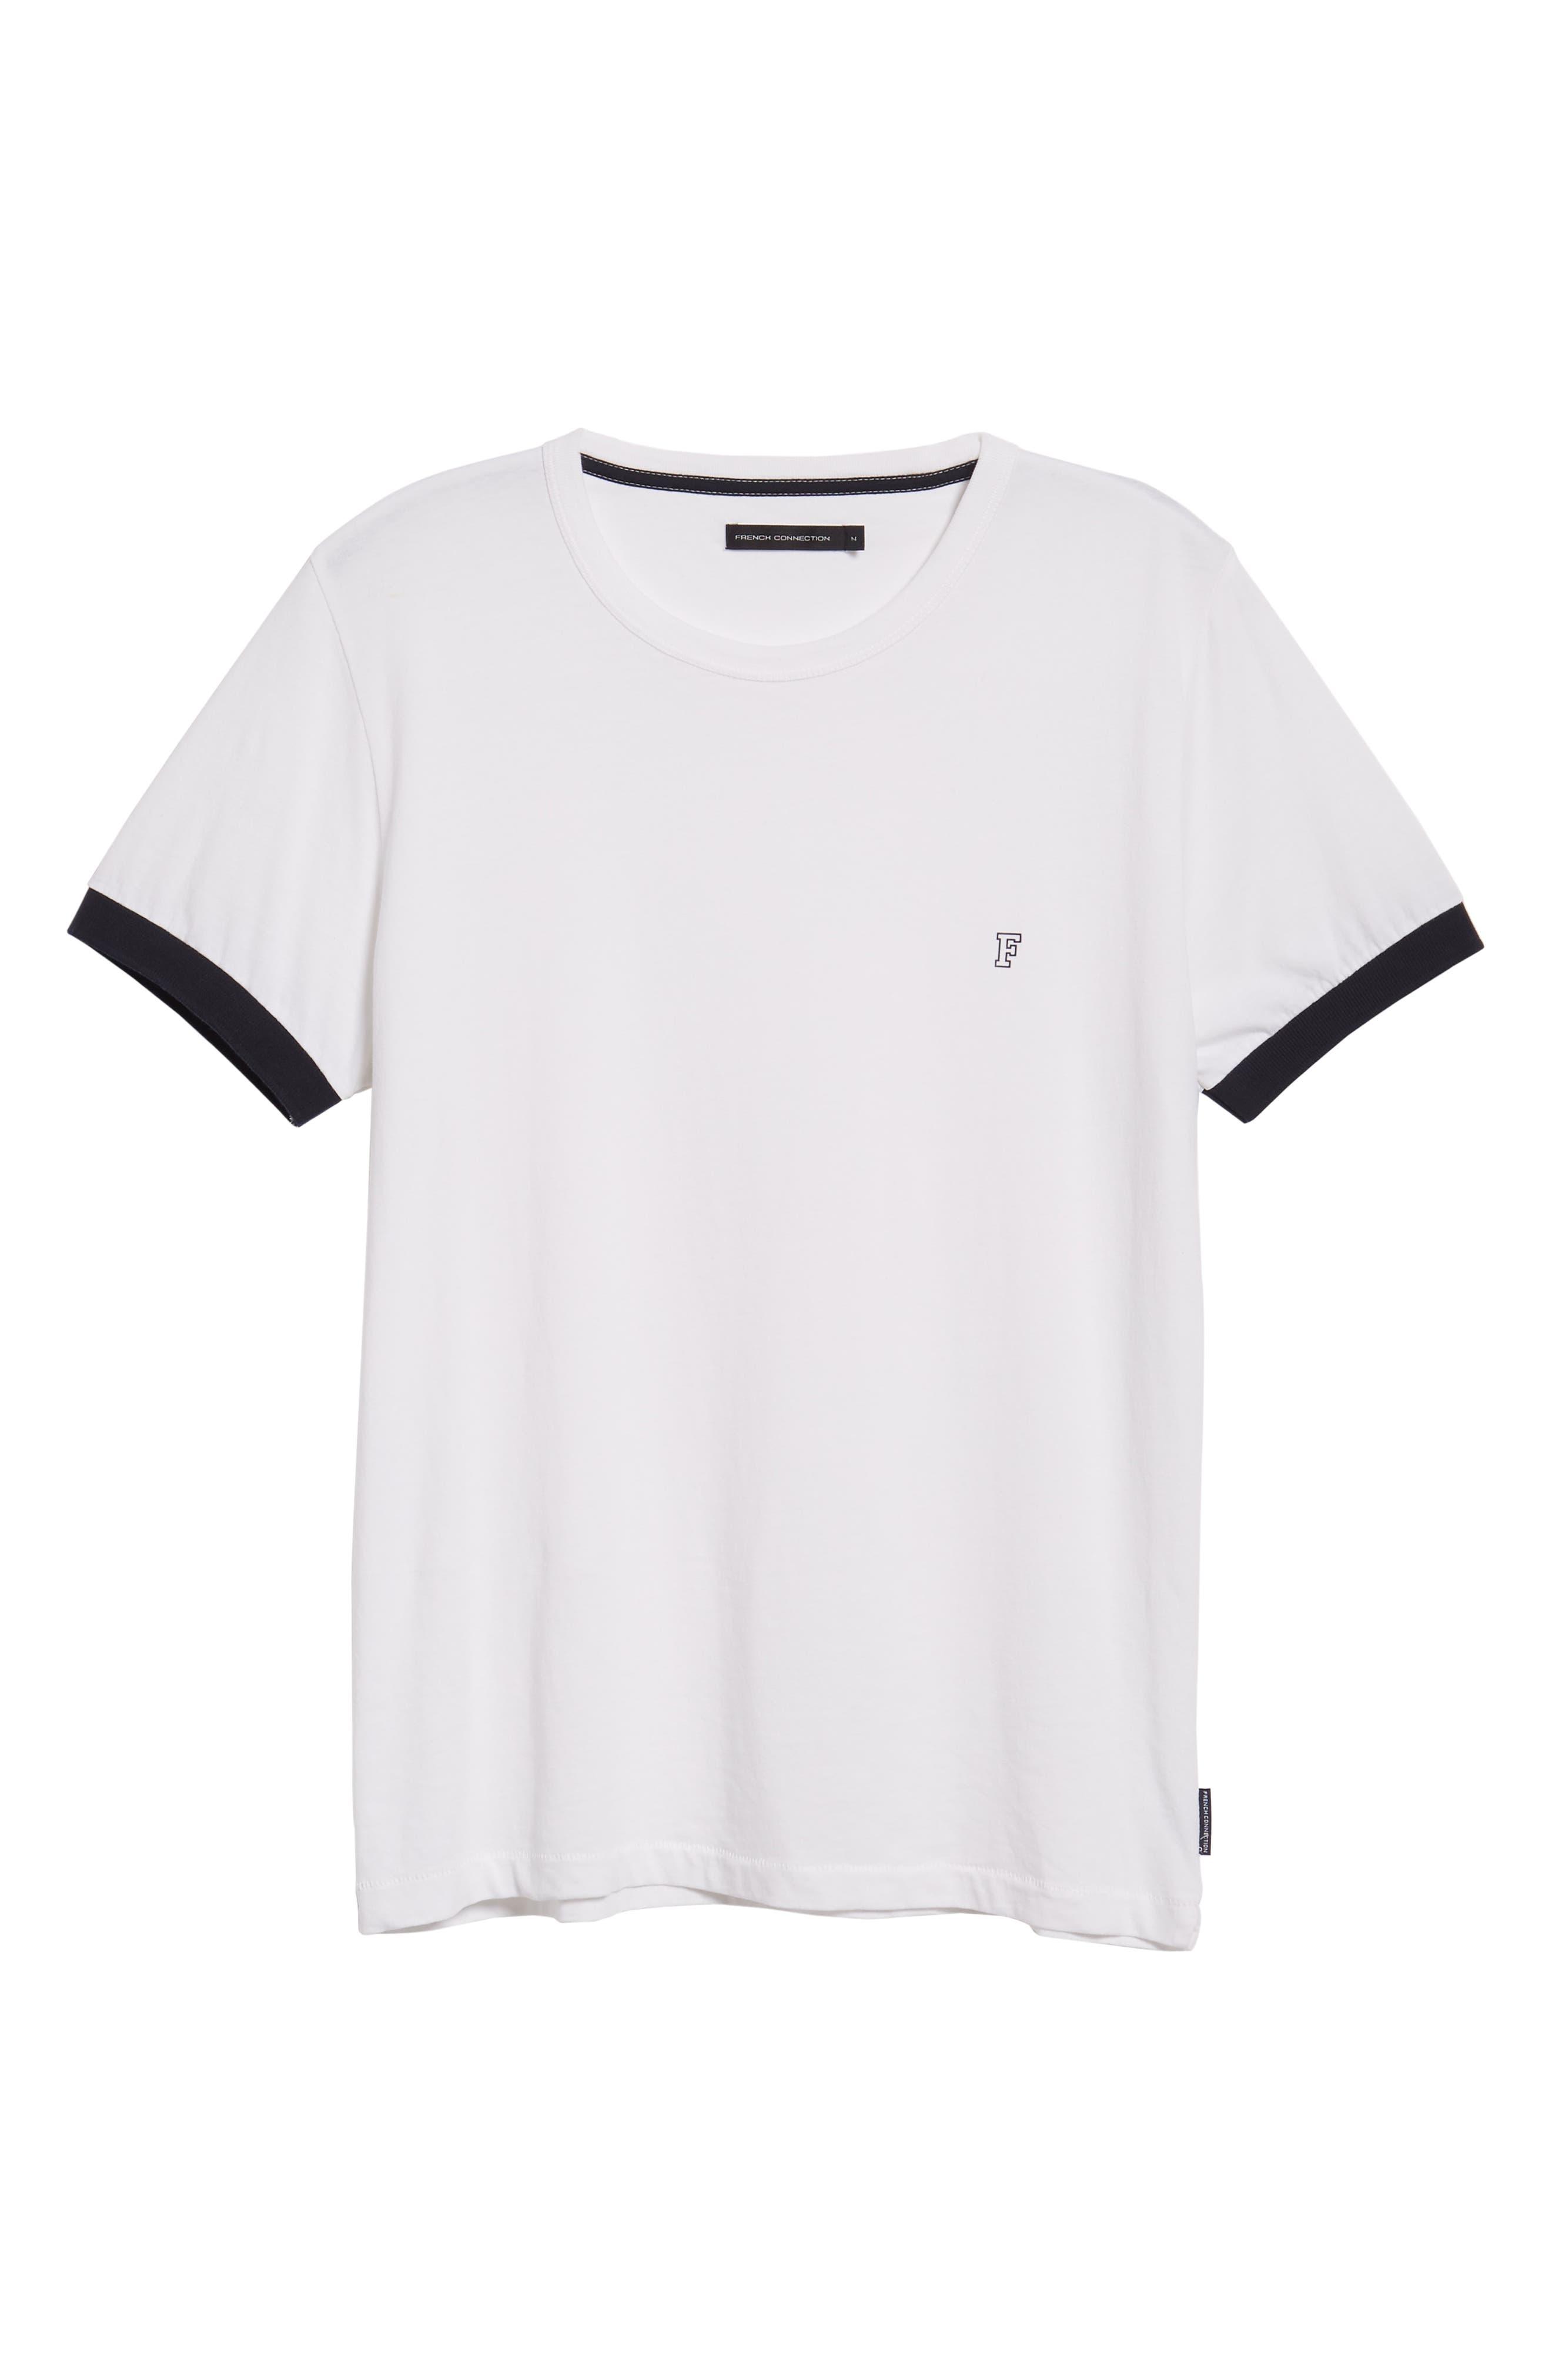 Summer Contrast Cuff T-Shirt,                             Alternate thumbnail 6, color,                             White Marine Blue